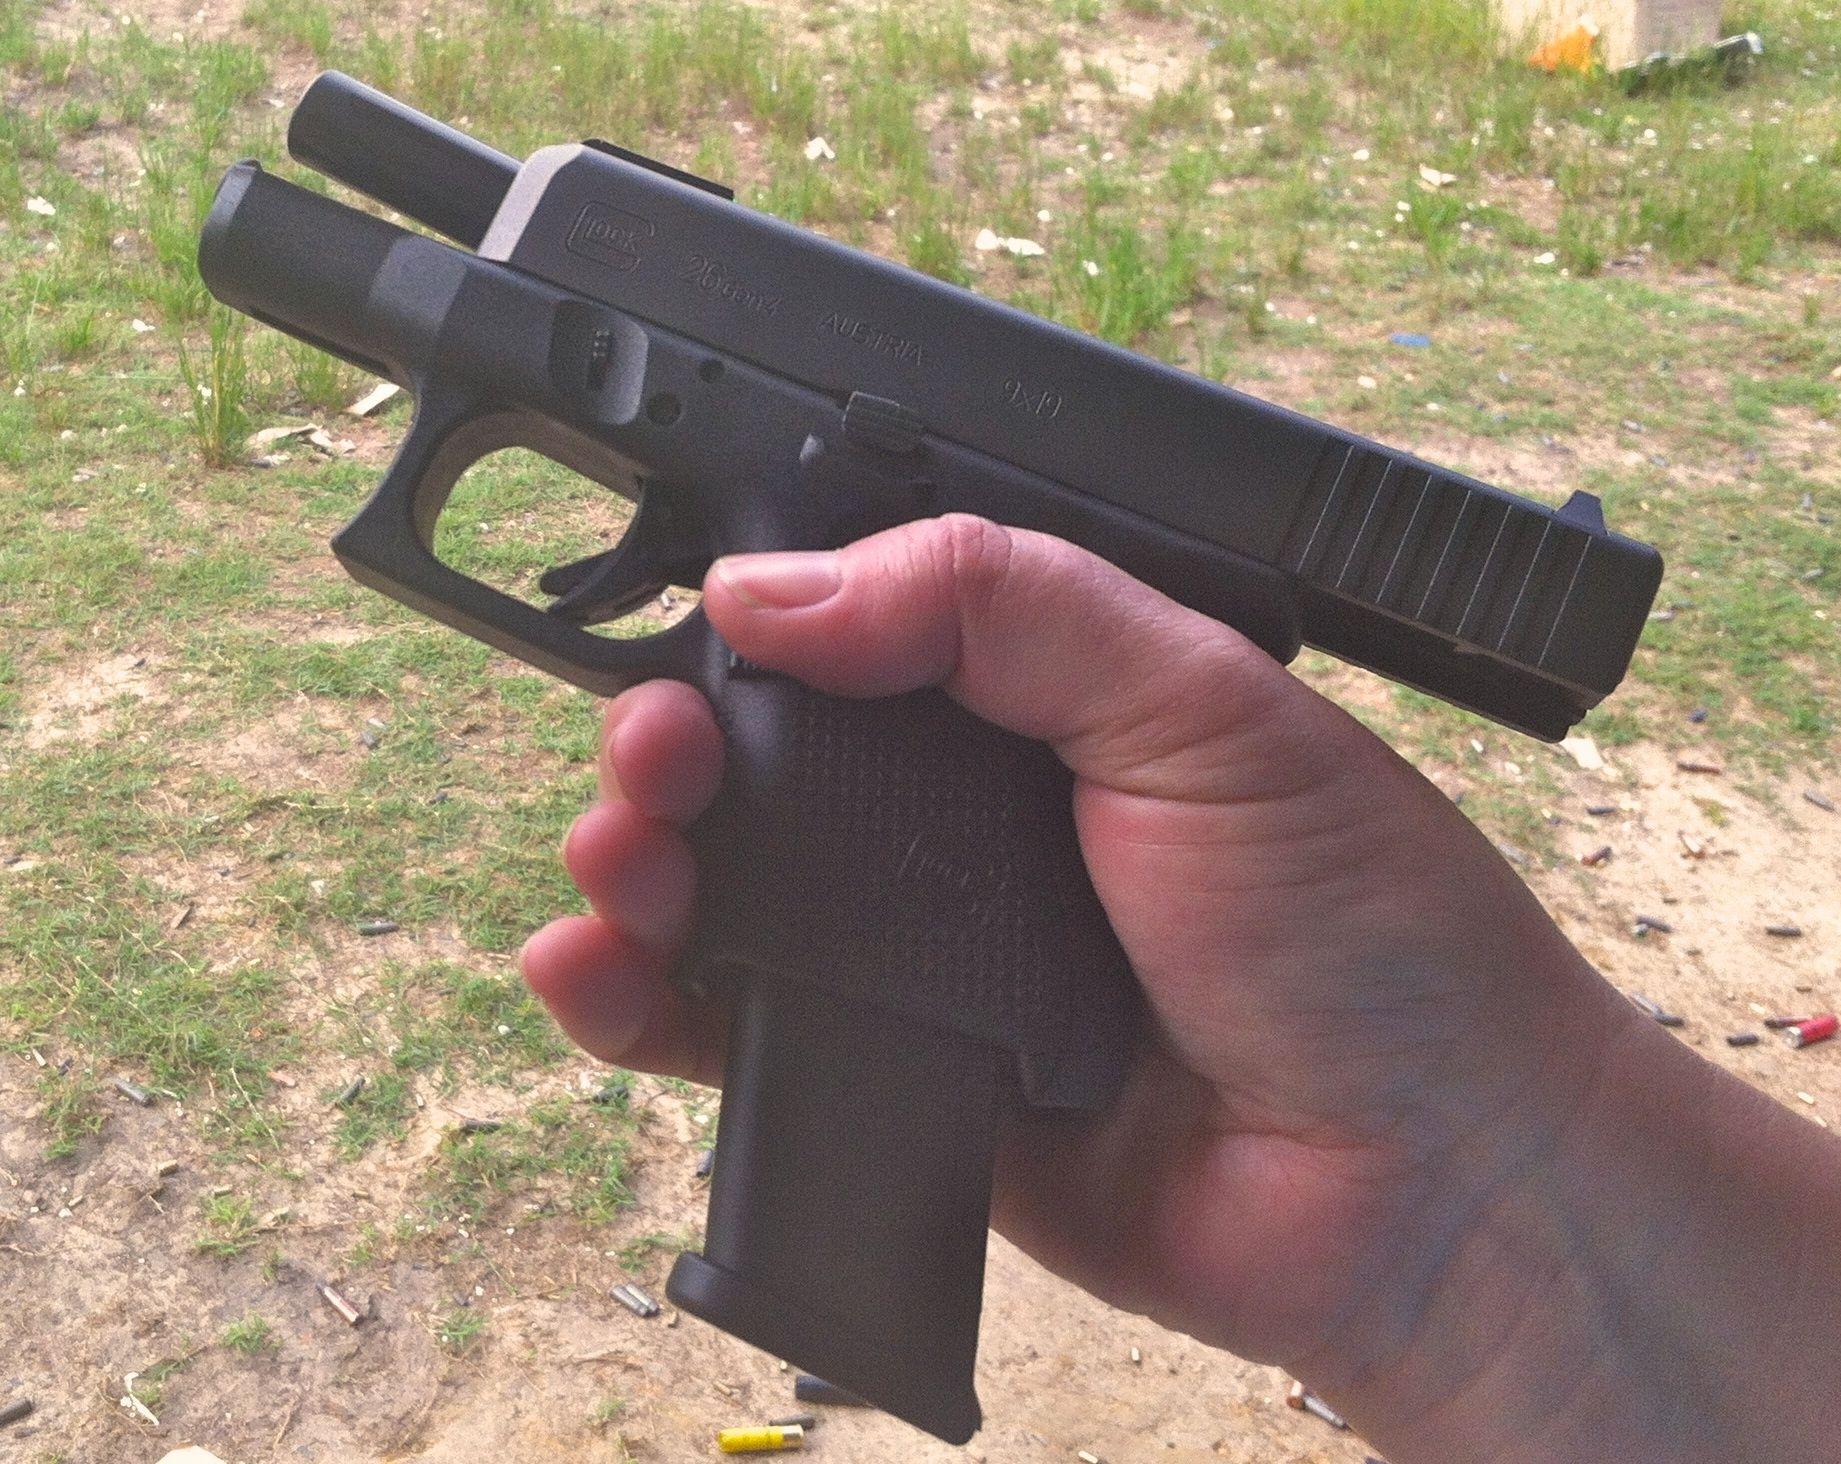 Gun Review: Gaston's G.I.L.F. - The Glock 26 Gen 4 Subcompact Pistol - My  Gun Culture